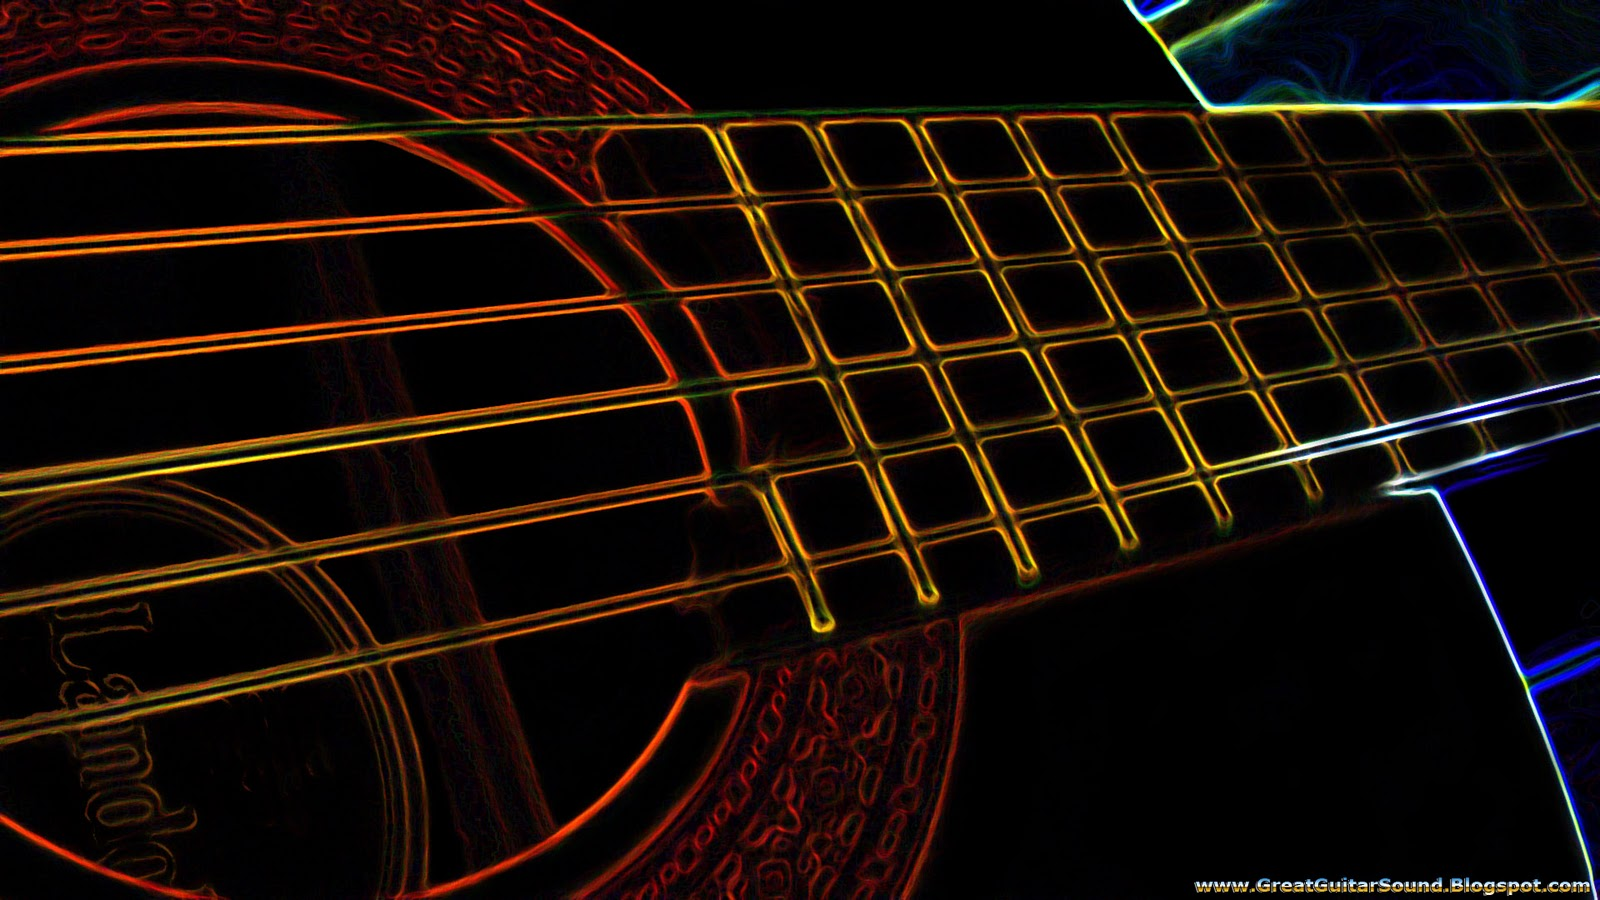 Great Guitar Sound Guitar Wallpaper Landola Classical